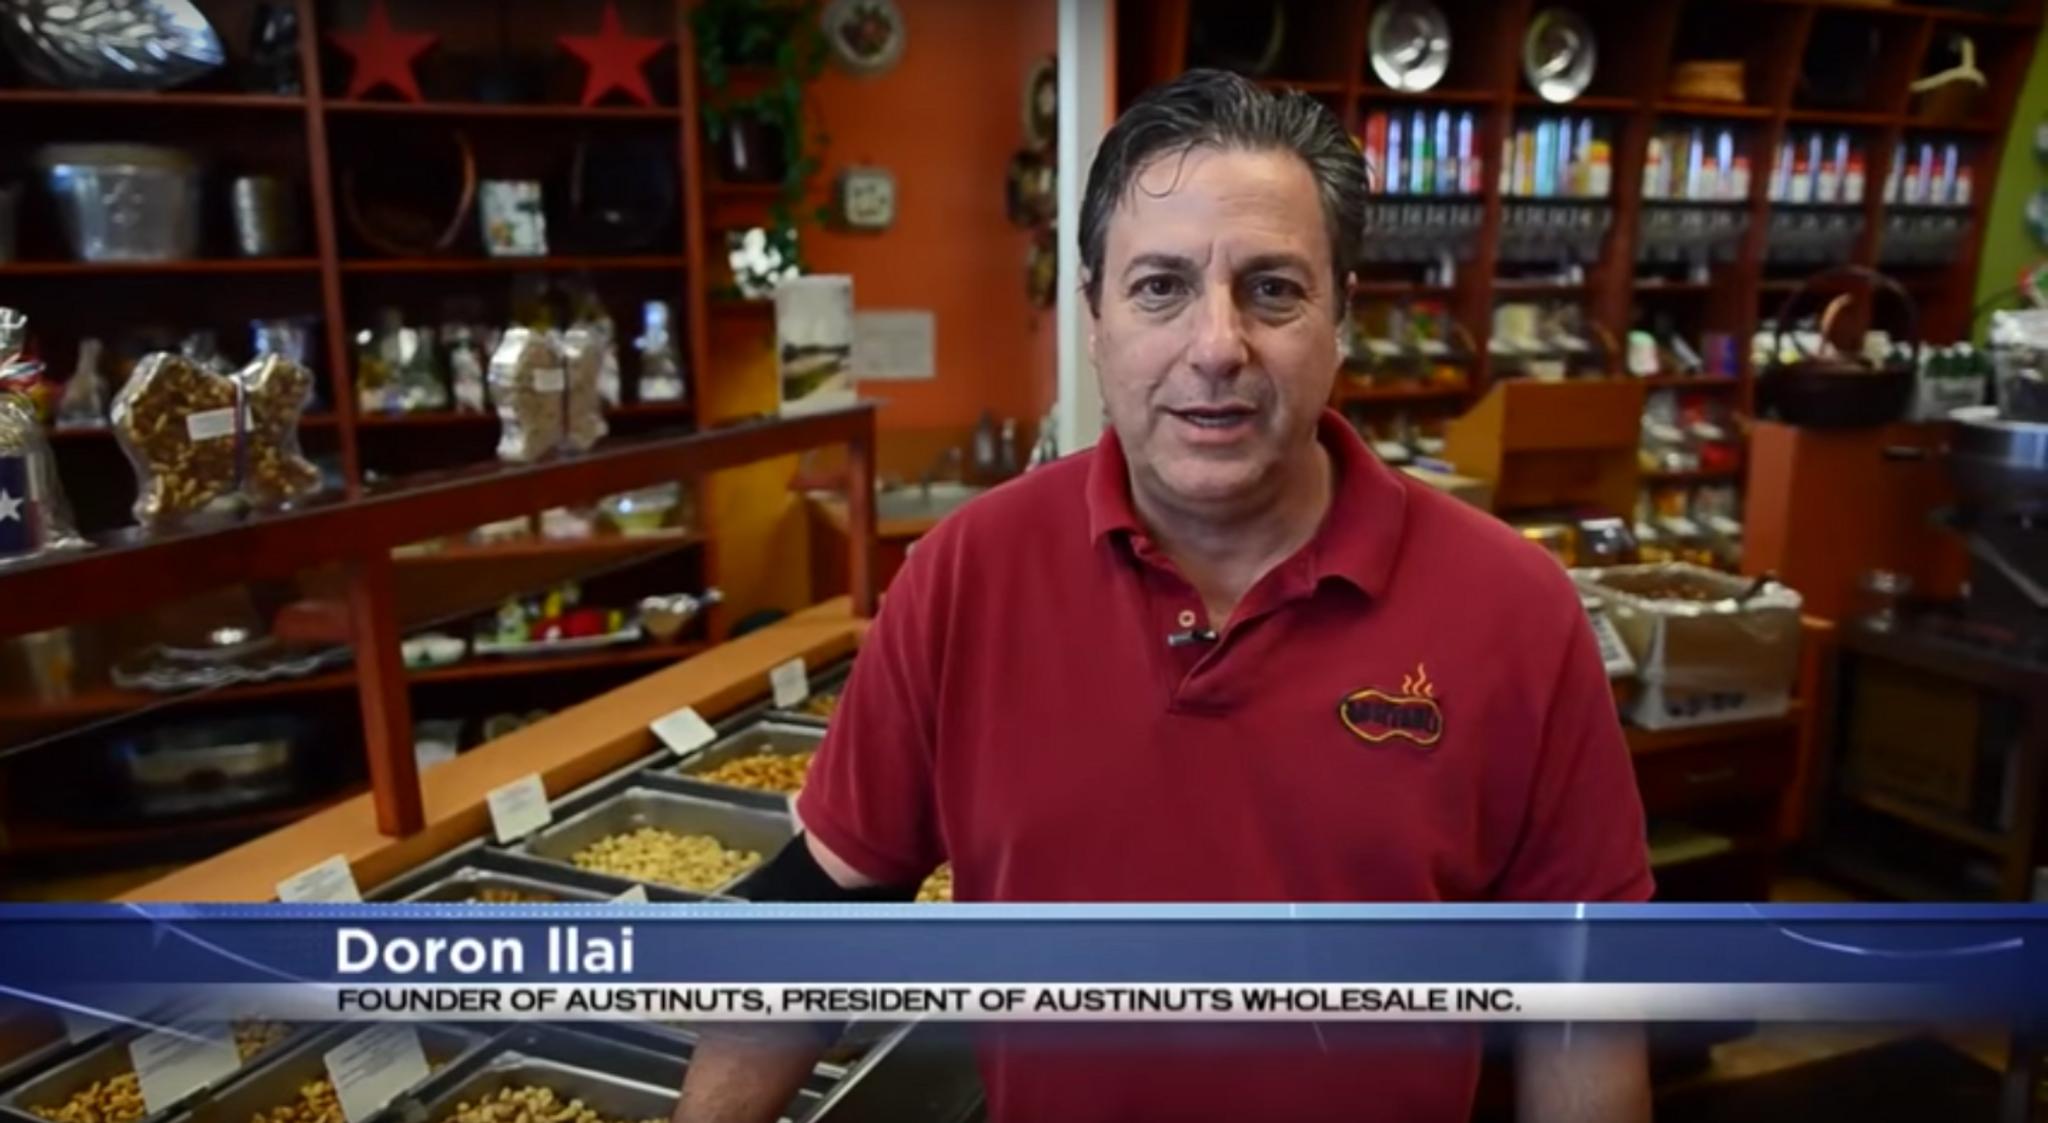 AustiNuts Business Story - Doron Ilai in Austin, TX